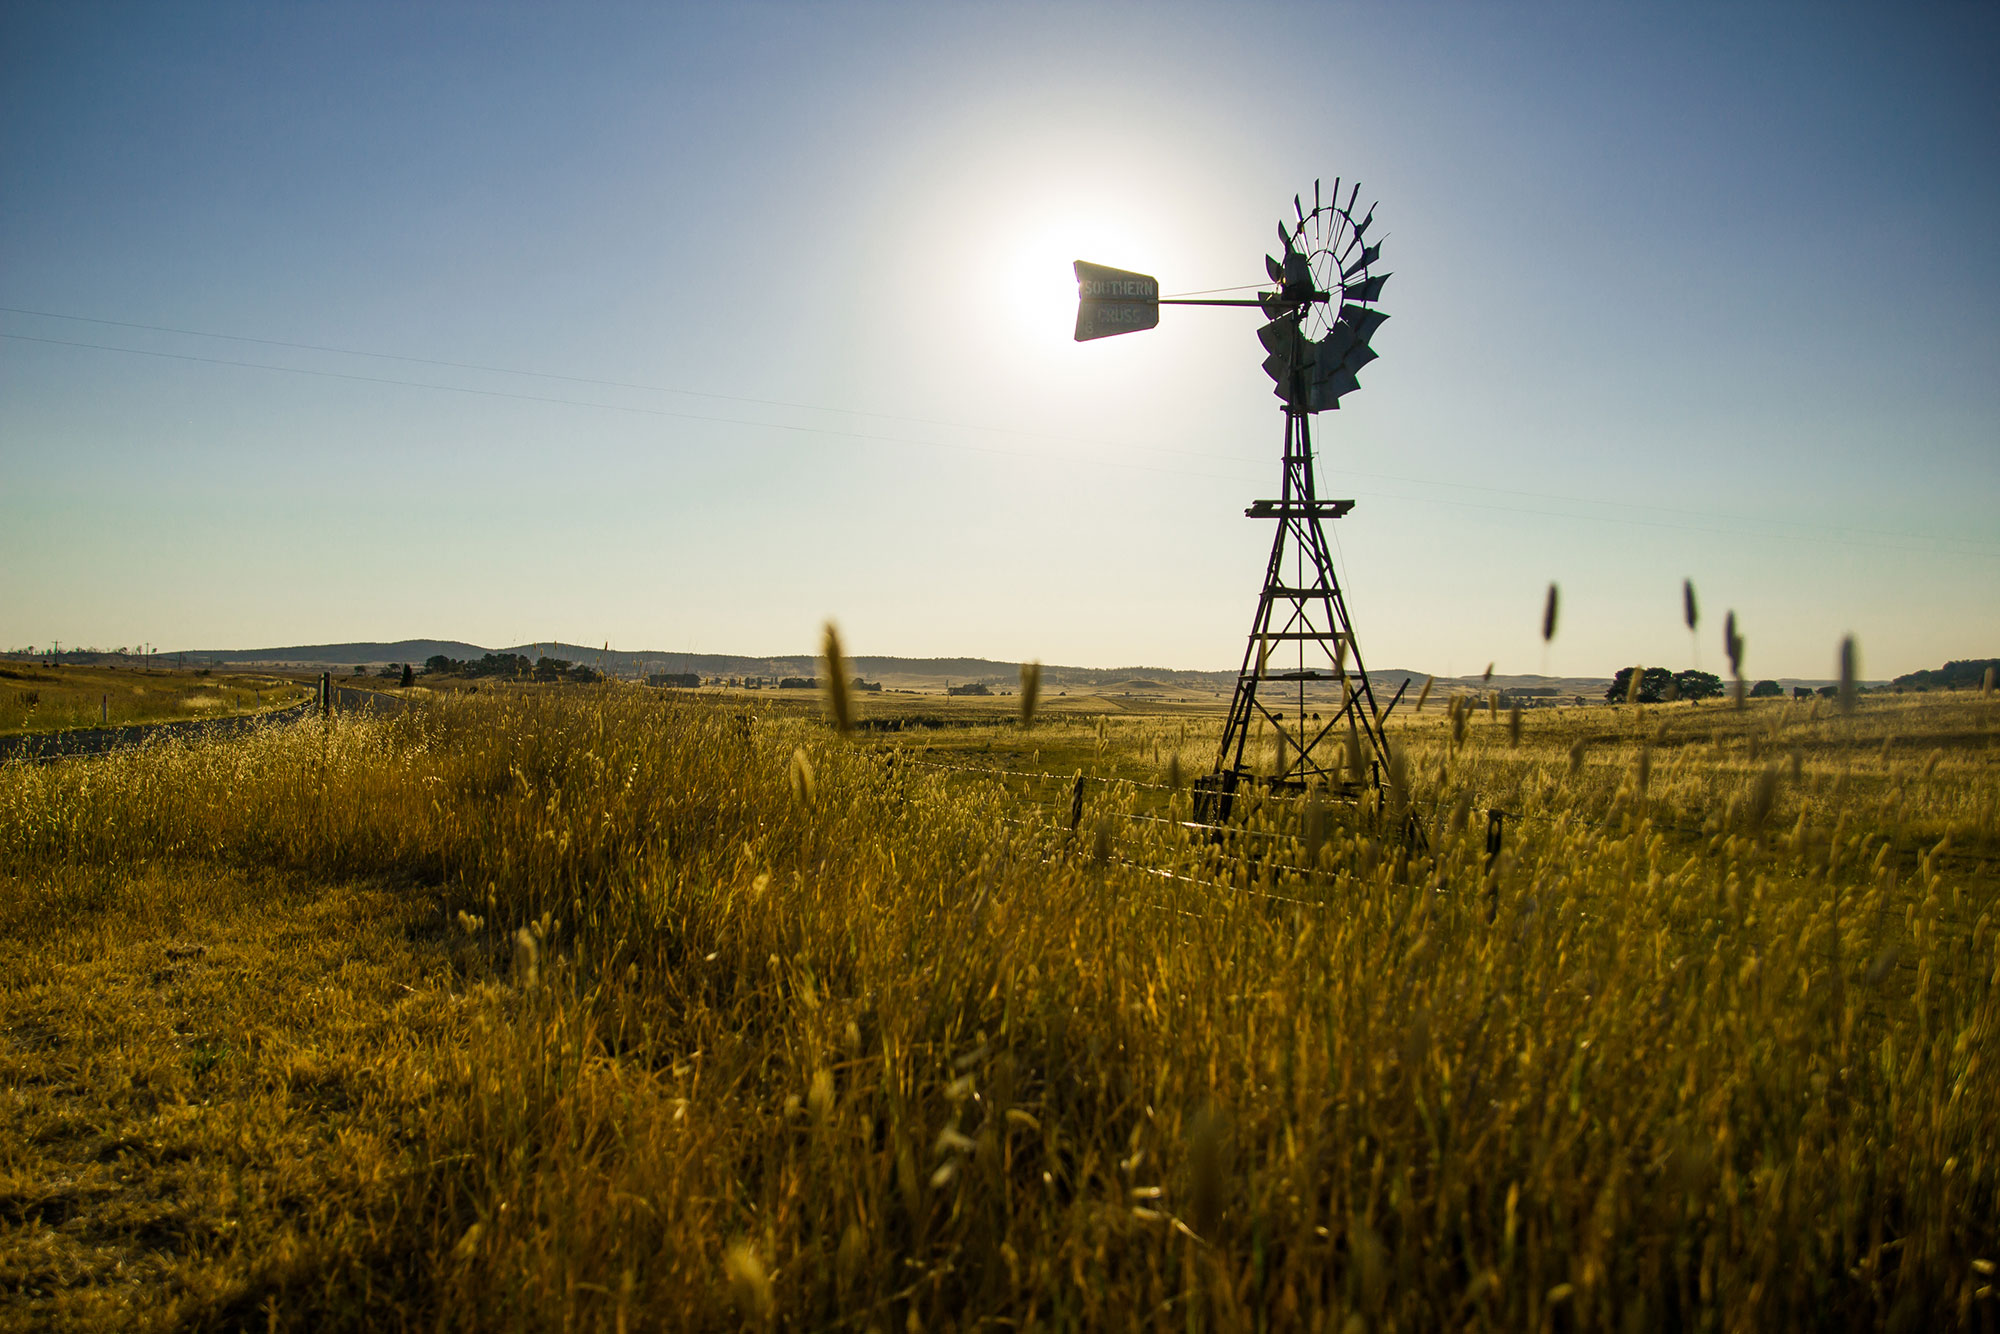 bigstock-Windmill-Silouhetted-In-Rural--81626480.jpg